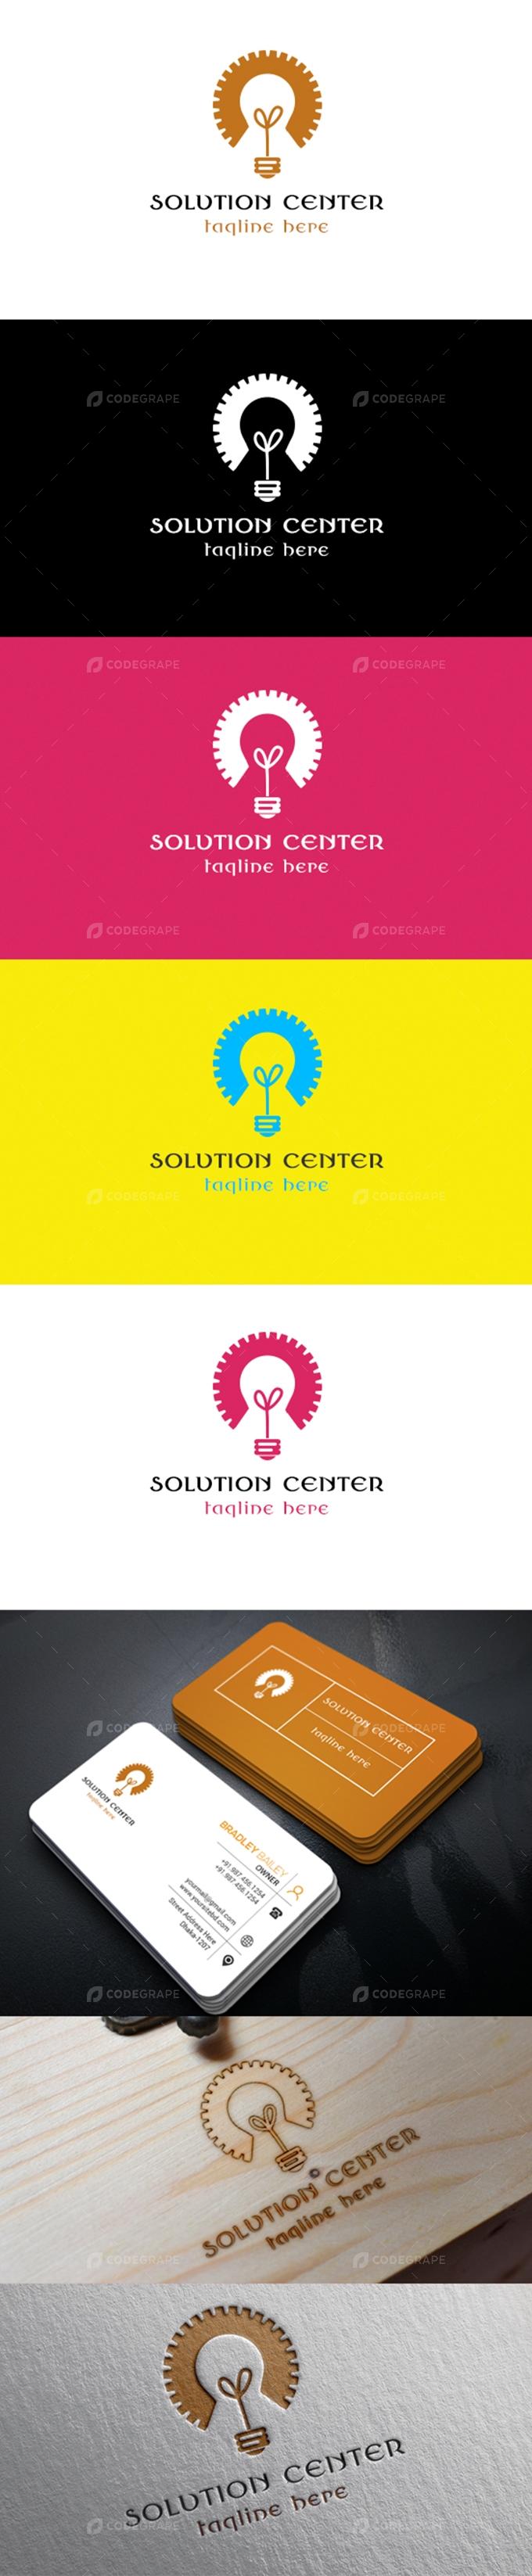 Solution Center Logo